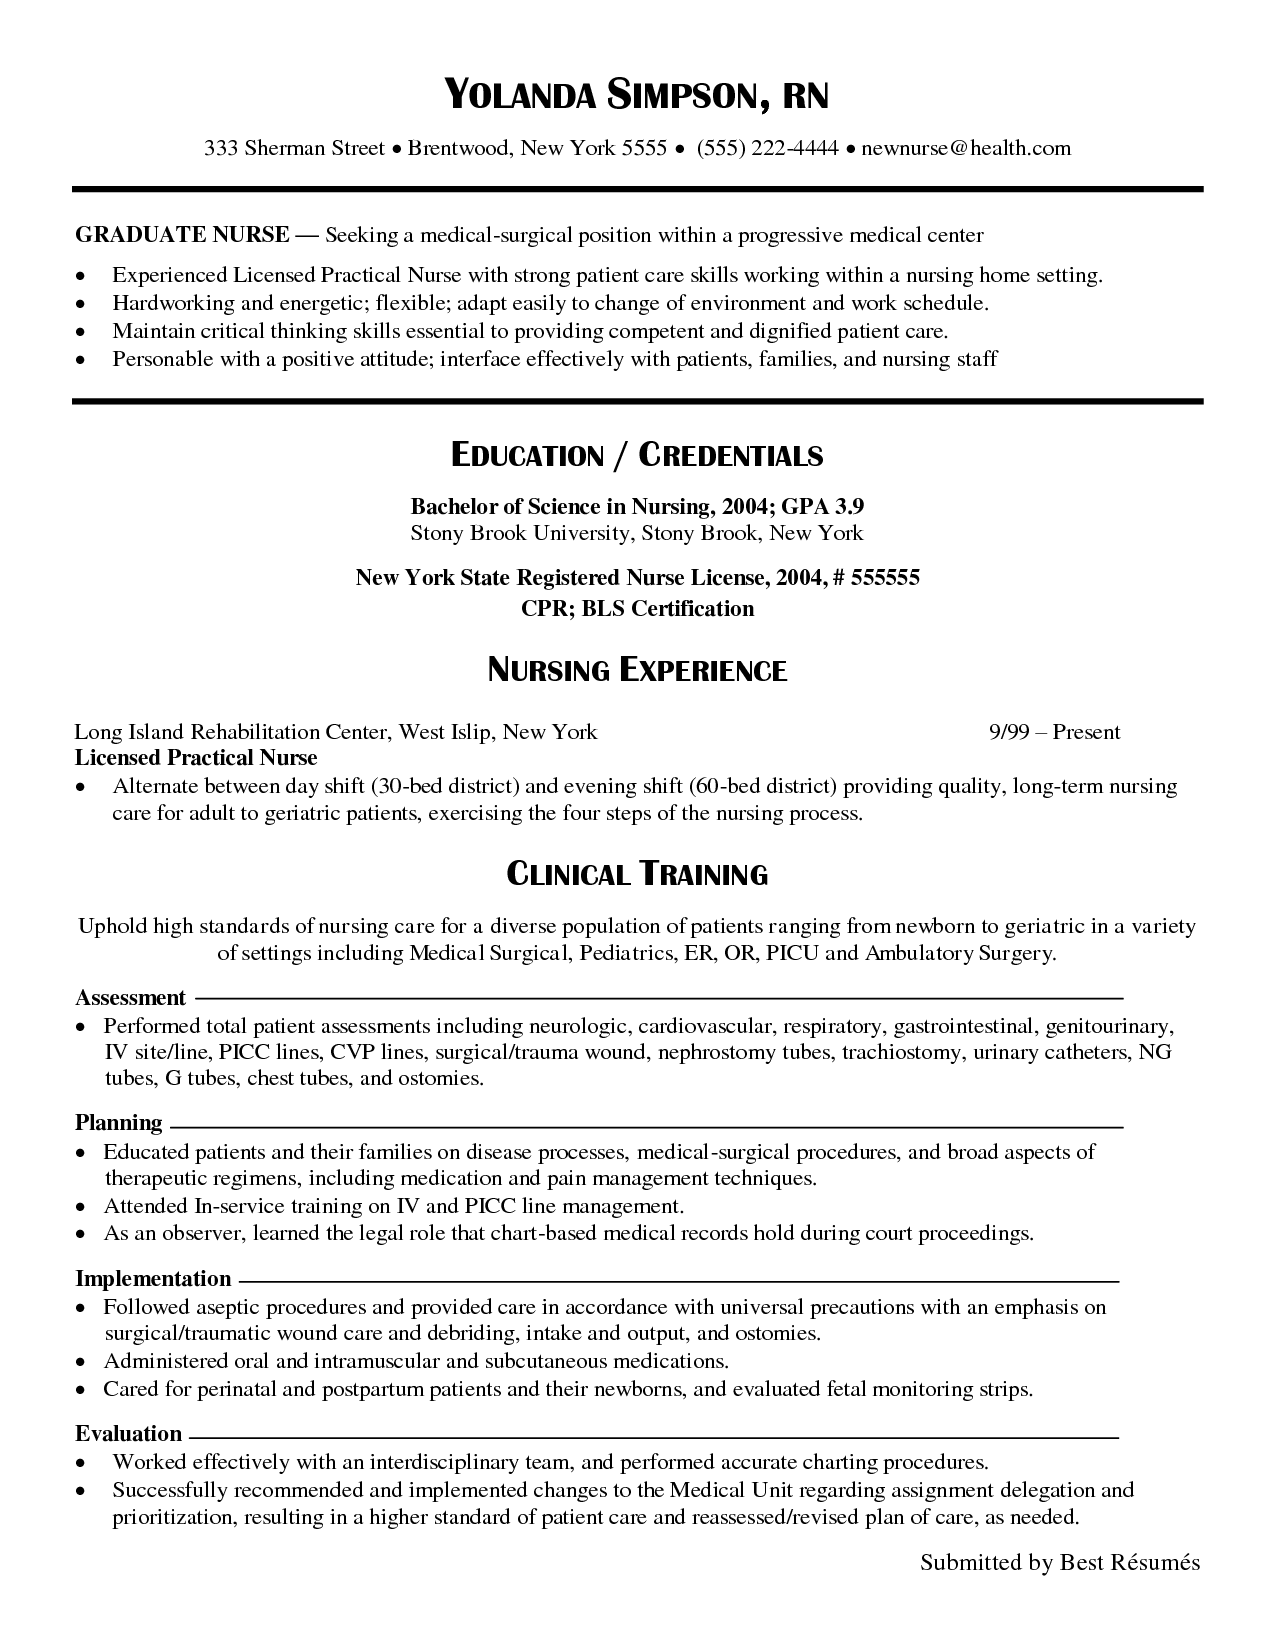 20 New Grad Nursing Resume Clinical Experience Nursing